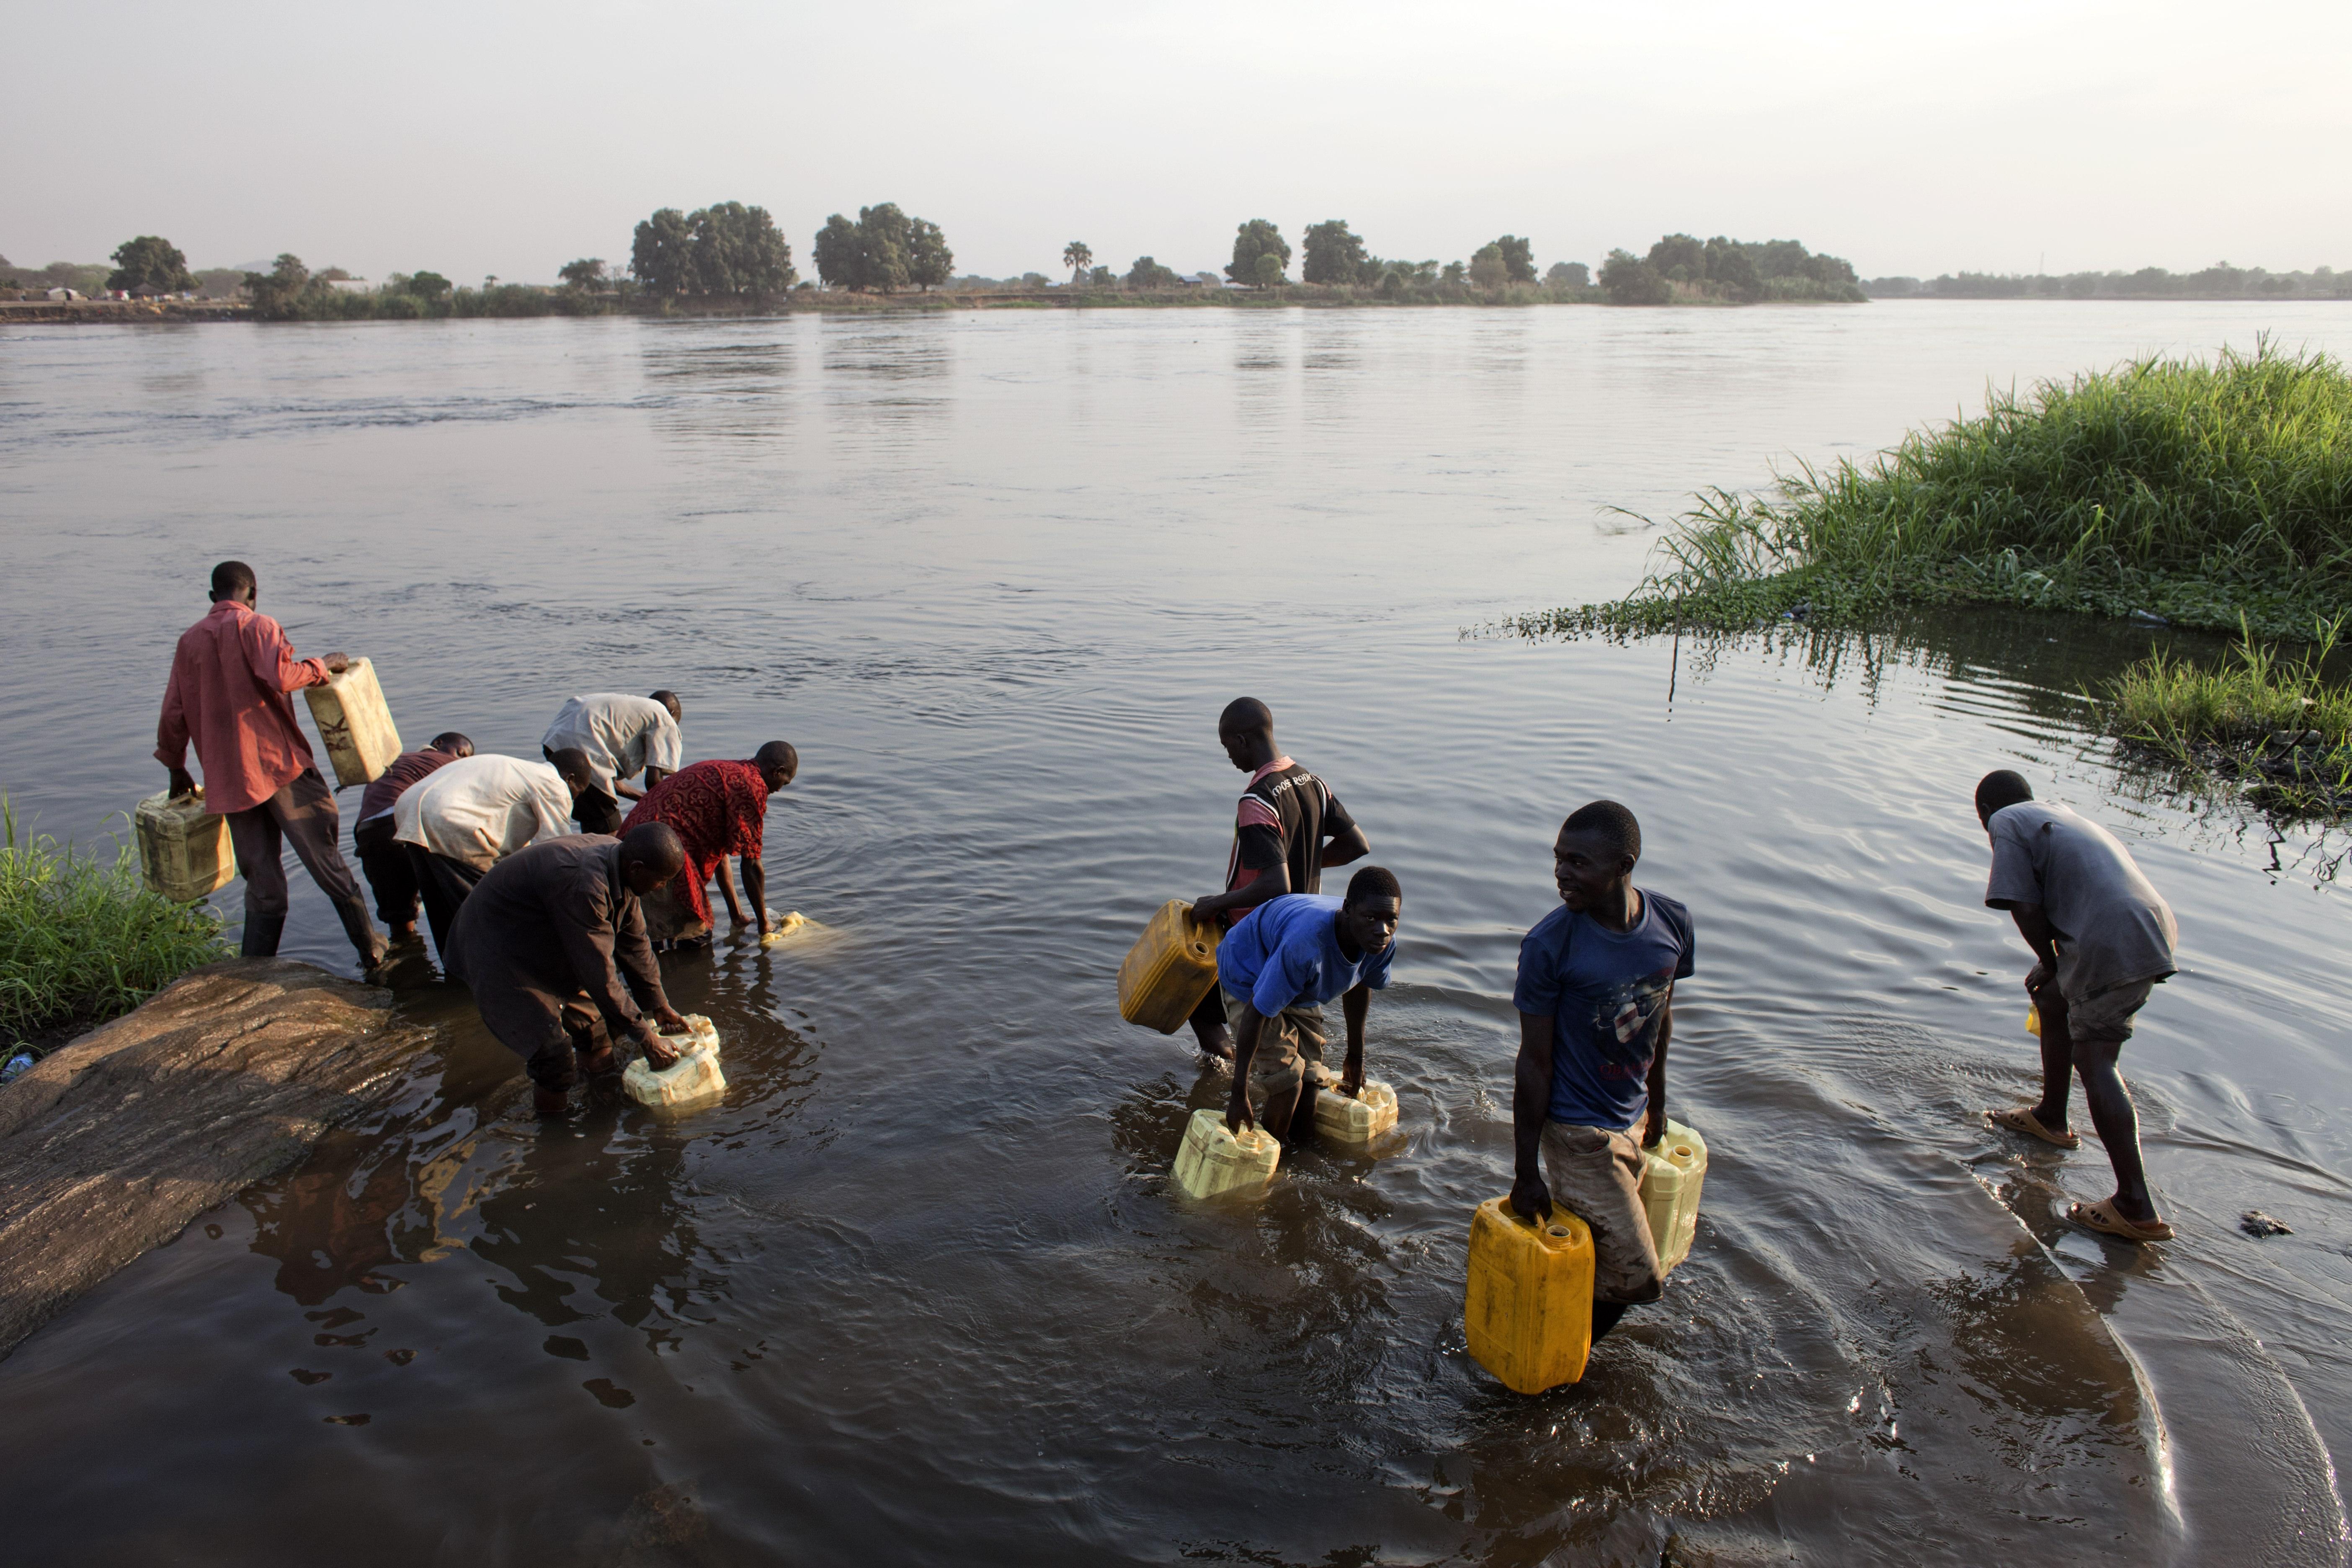 Amref operating in southern sudan and kenya marco di lauro juba southern sudan february 8 2011 sciox Images